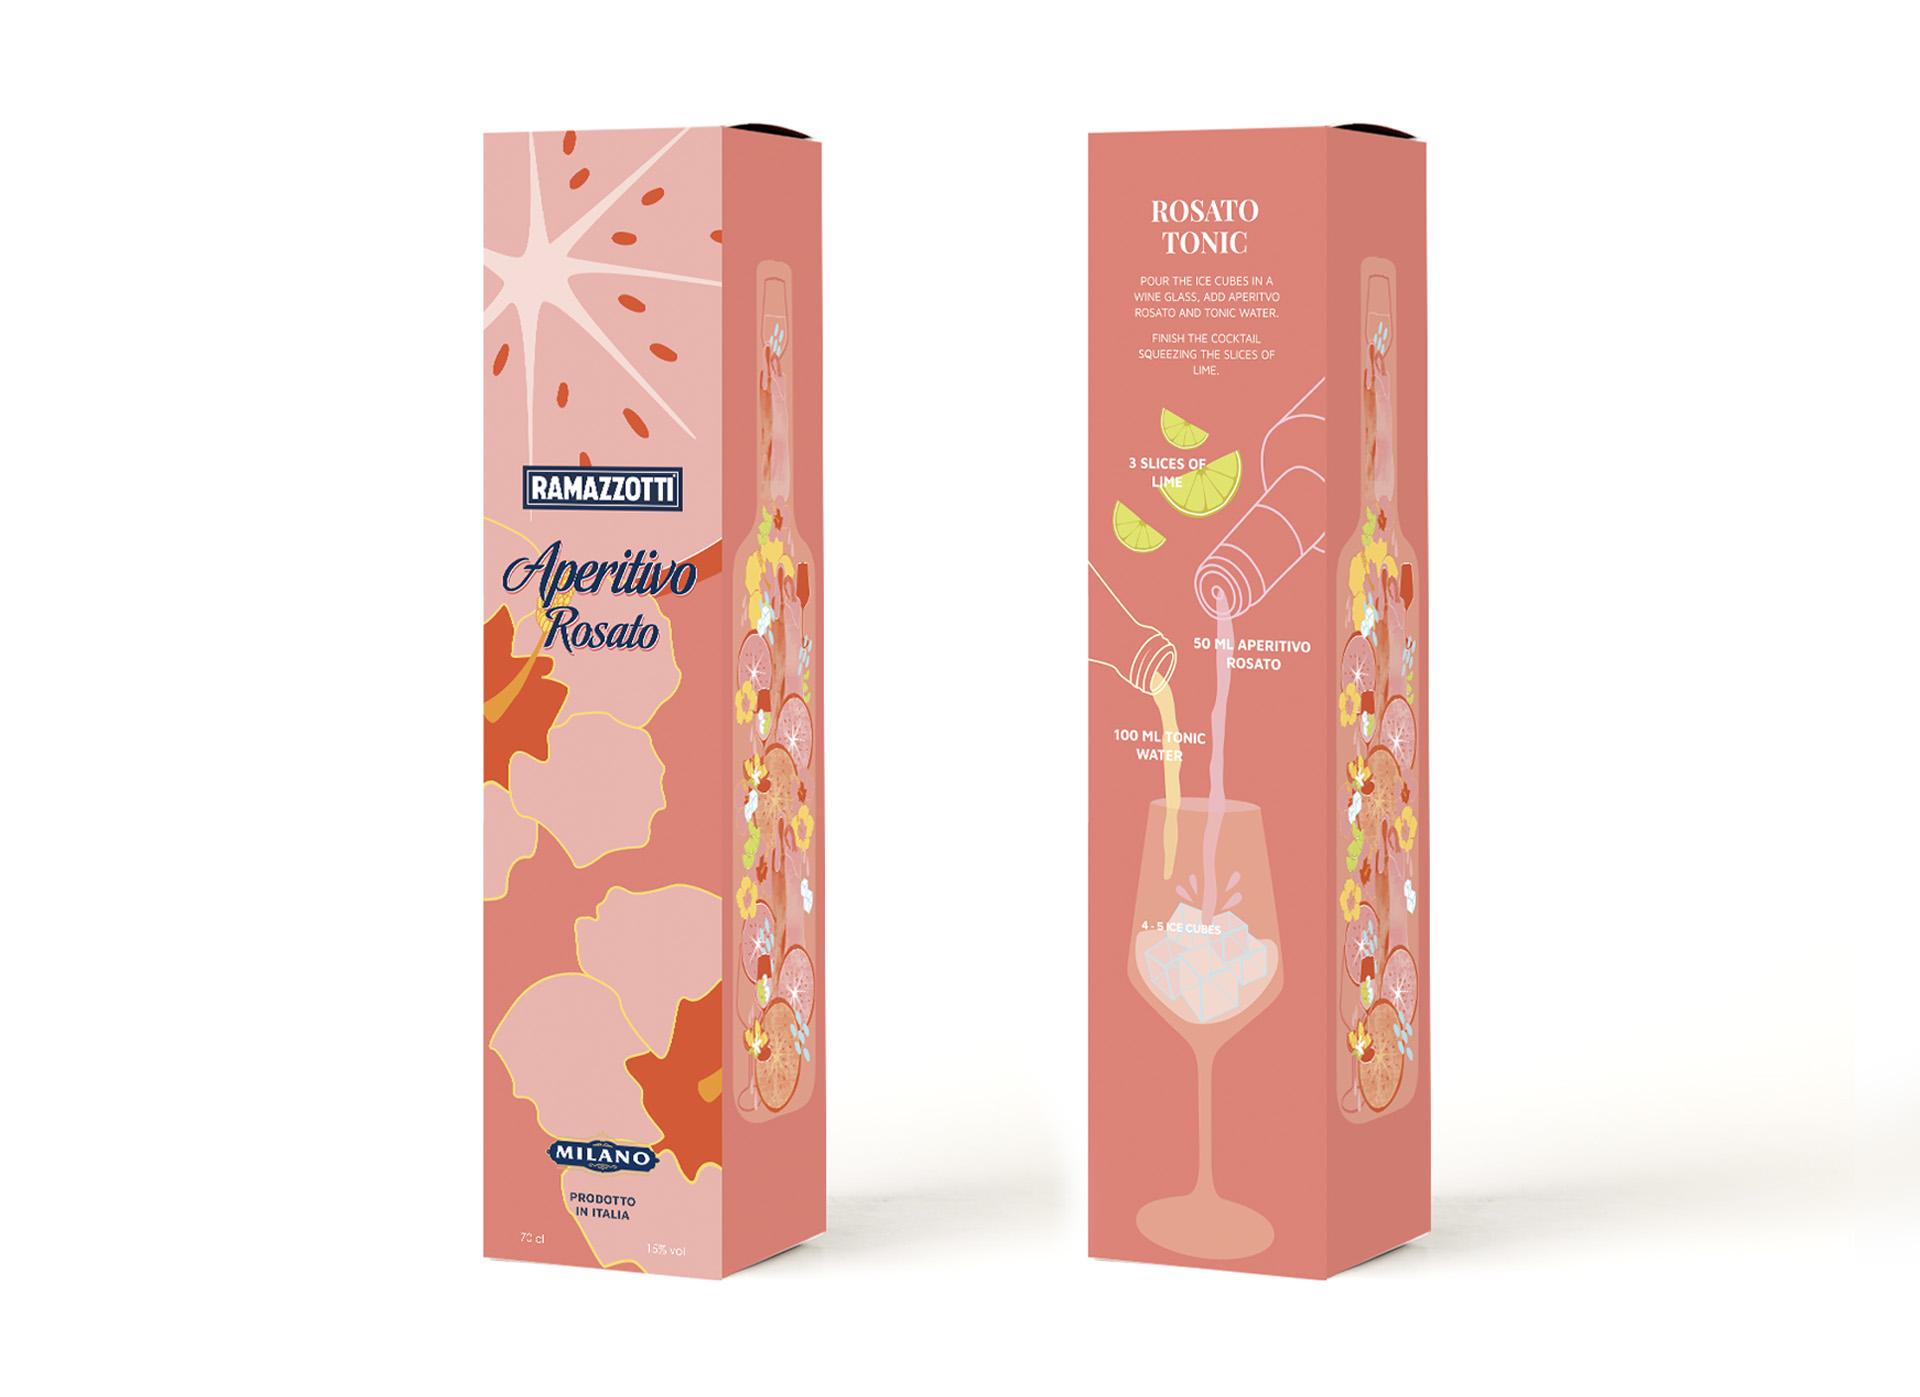 Ramazzotti Aperitivo Rosato Packaging Design by Magdalena Weiss